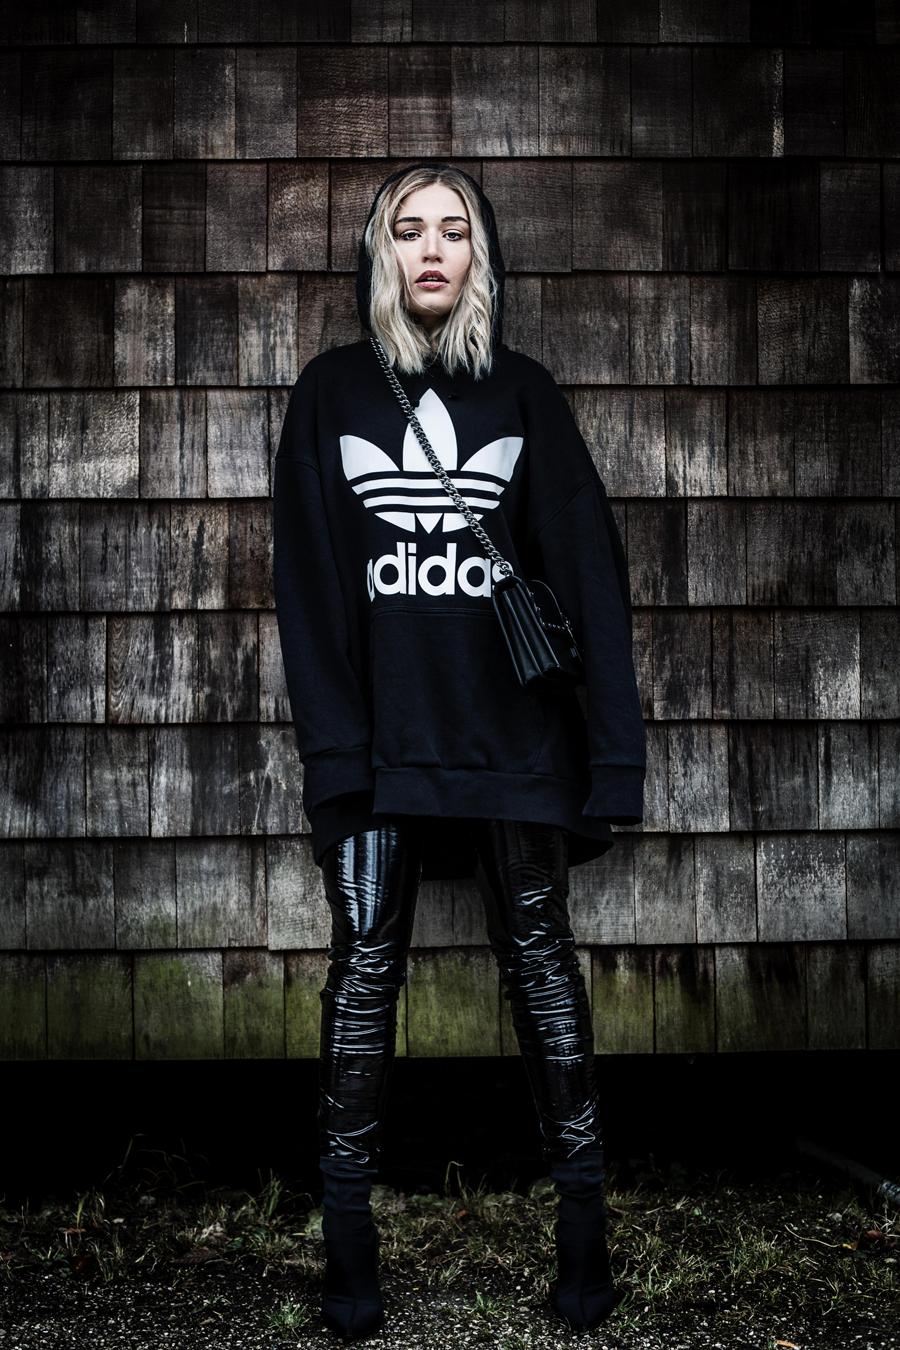 lauralamode-fashion-mode-fashionblogger-blogger-adidas-adidas originals-loavies-outfit-ootd-streetstyle-style-fashionblog-munich-muenchen-muc